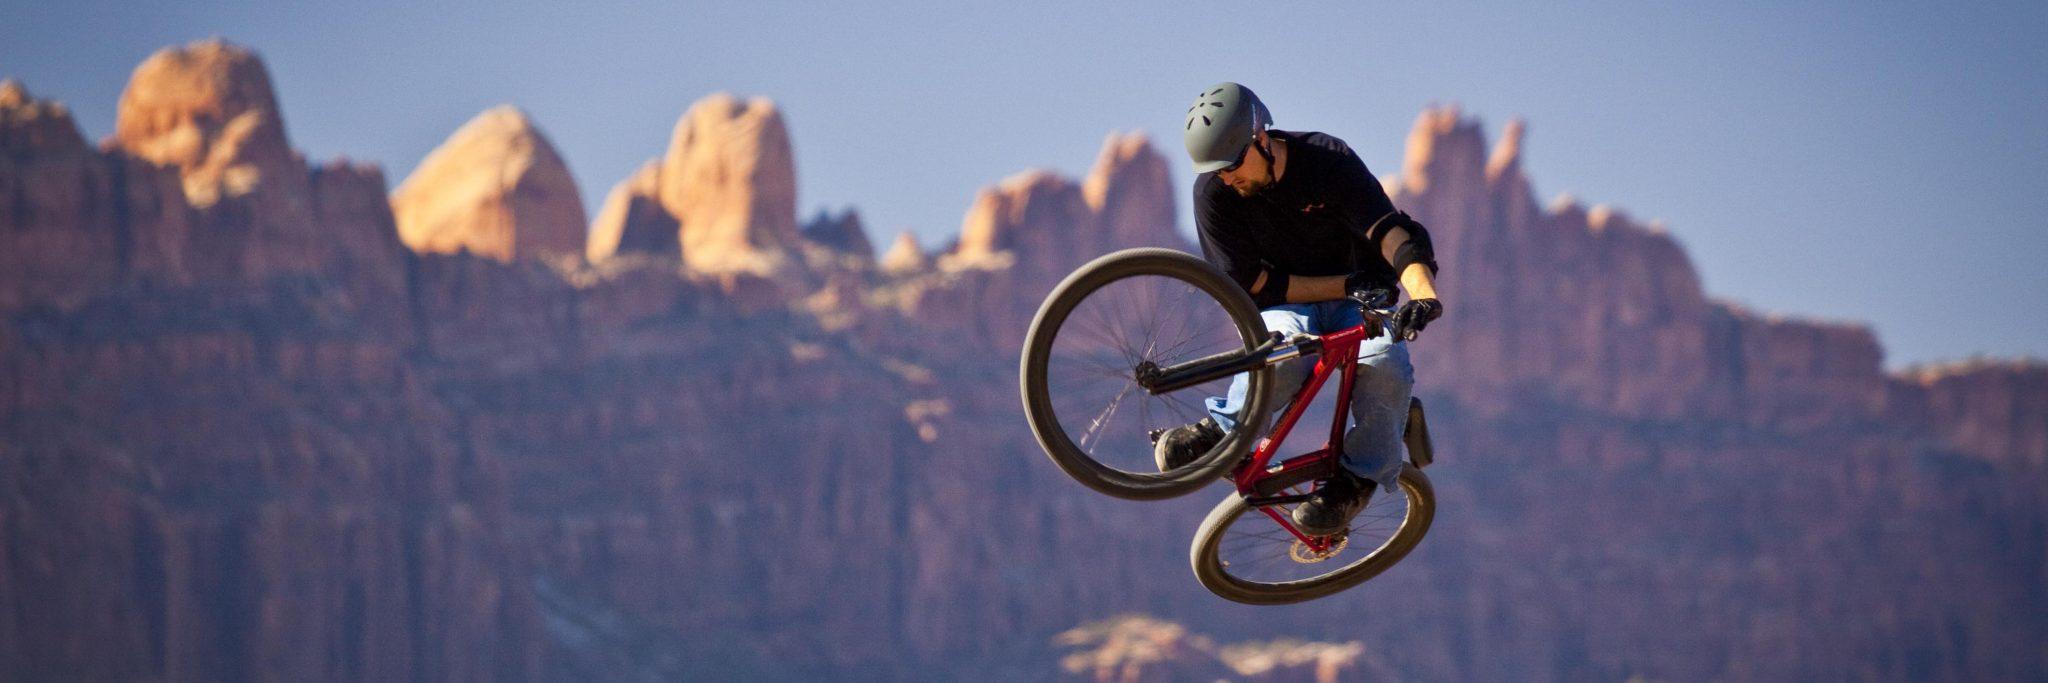 Moab Rim, Catching big air